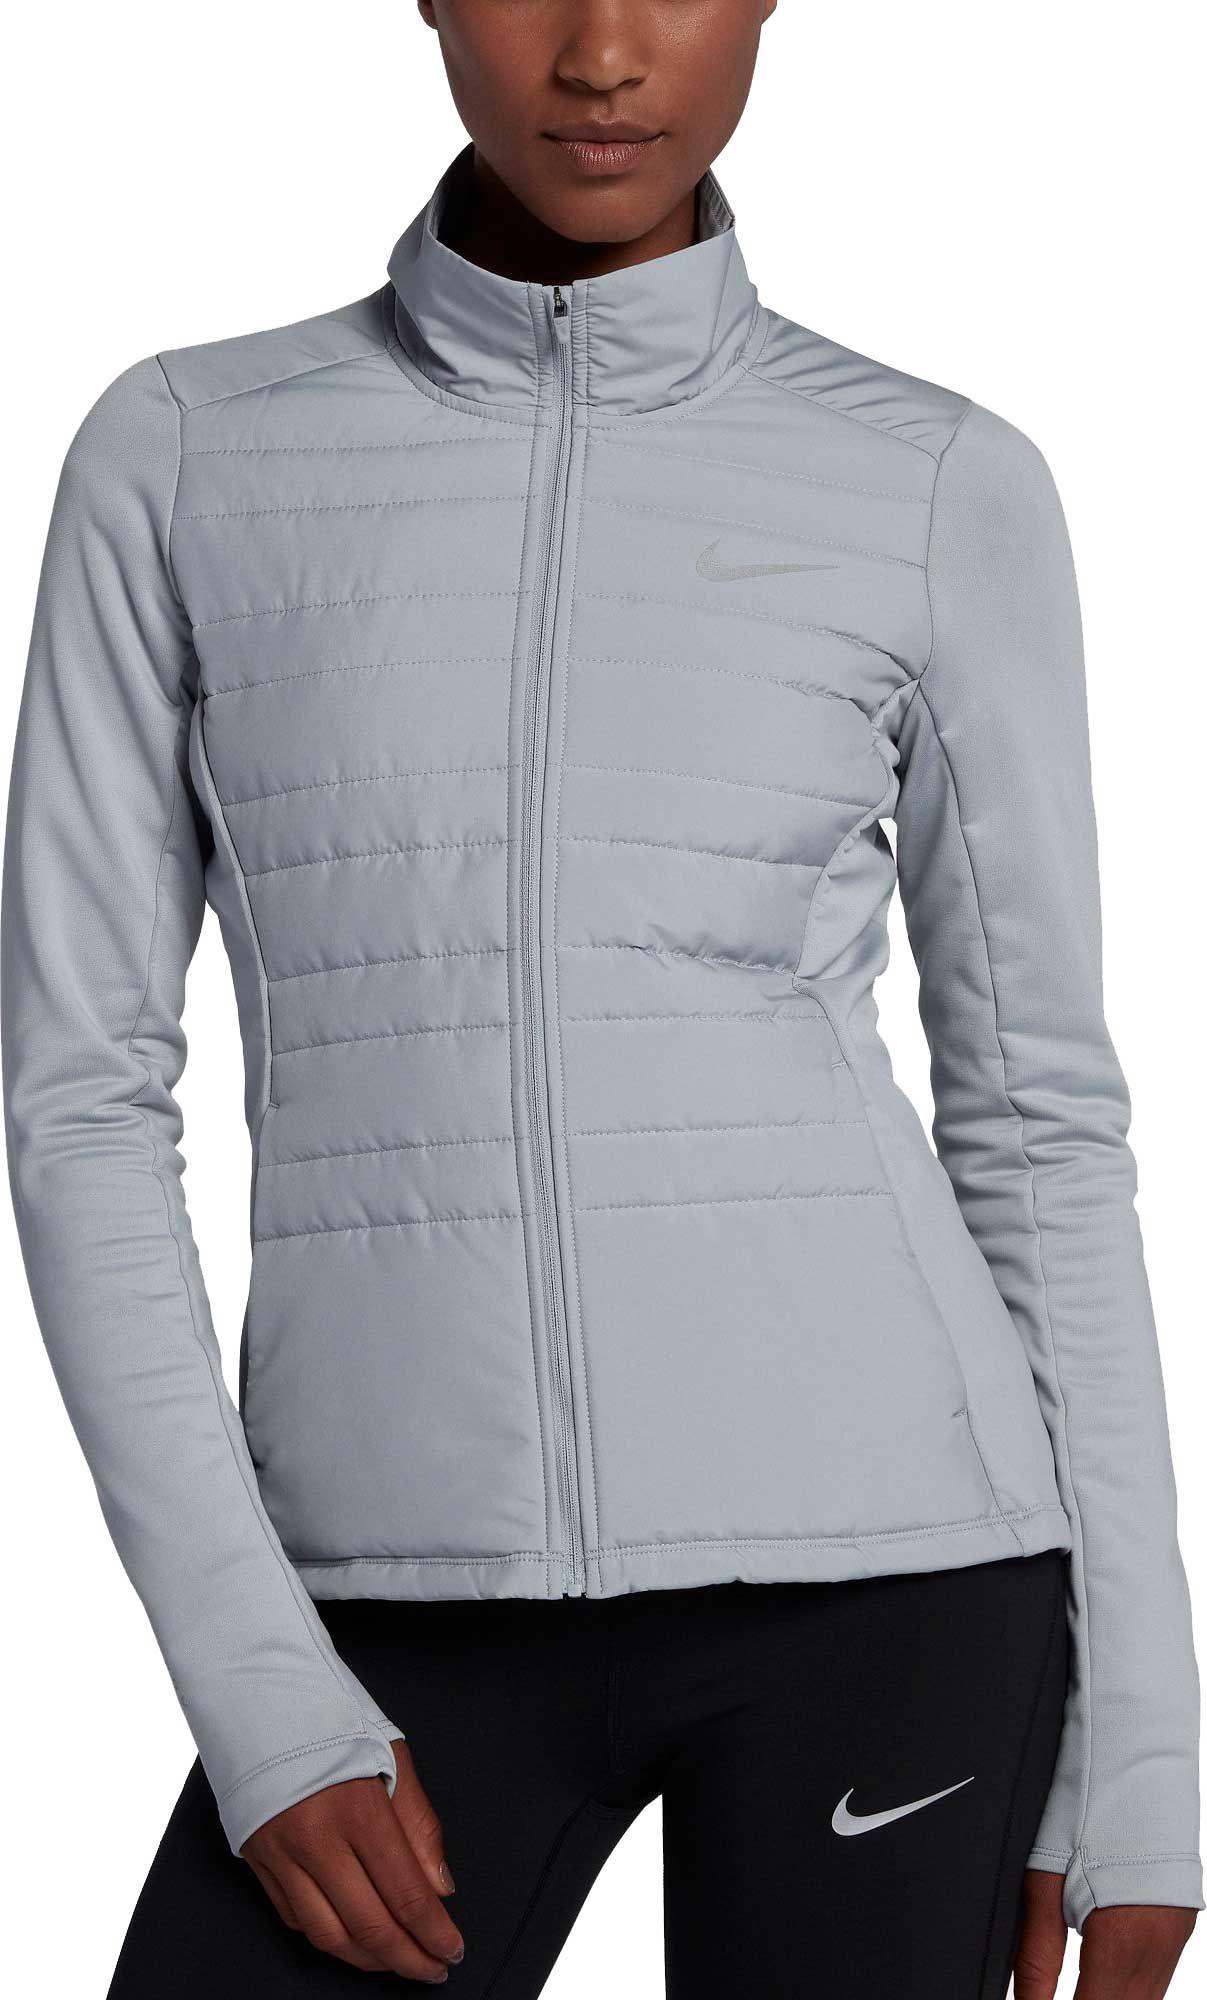 Nike jacket women's running